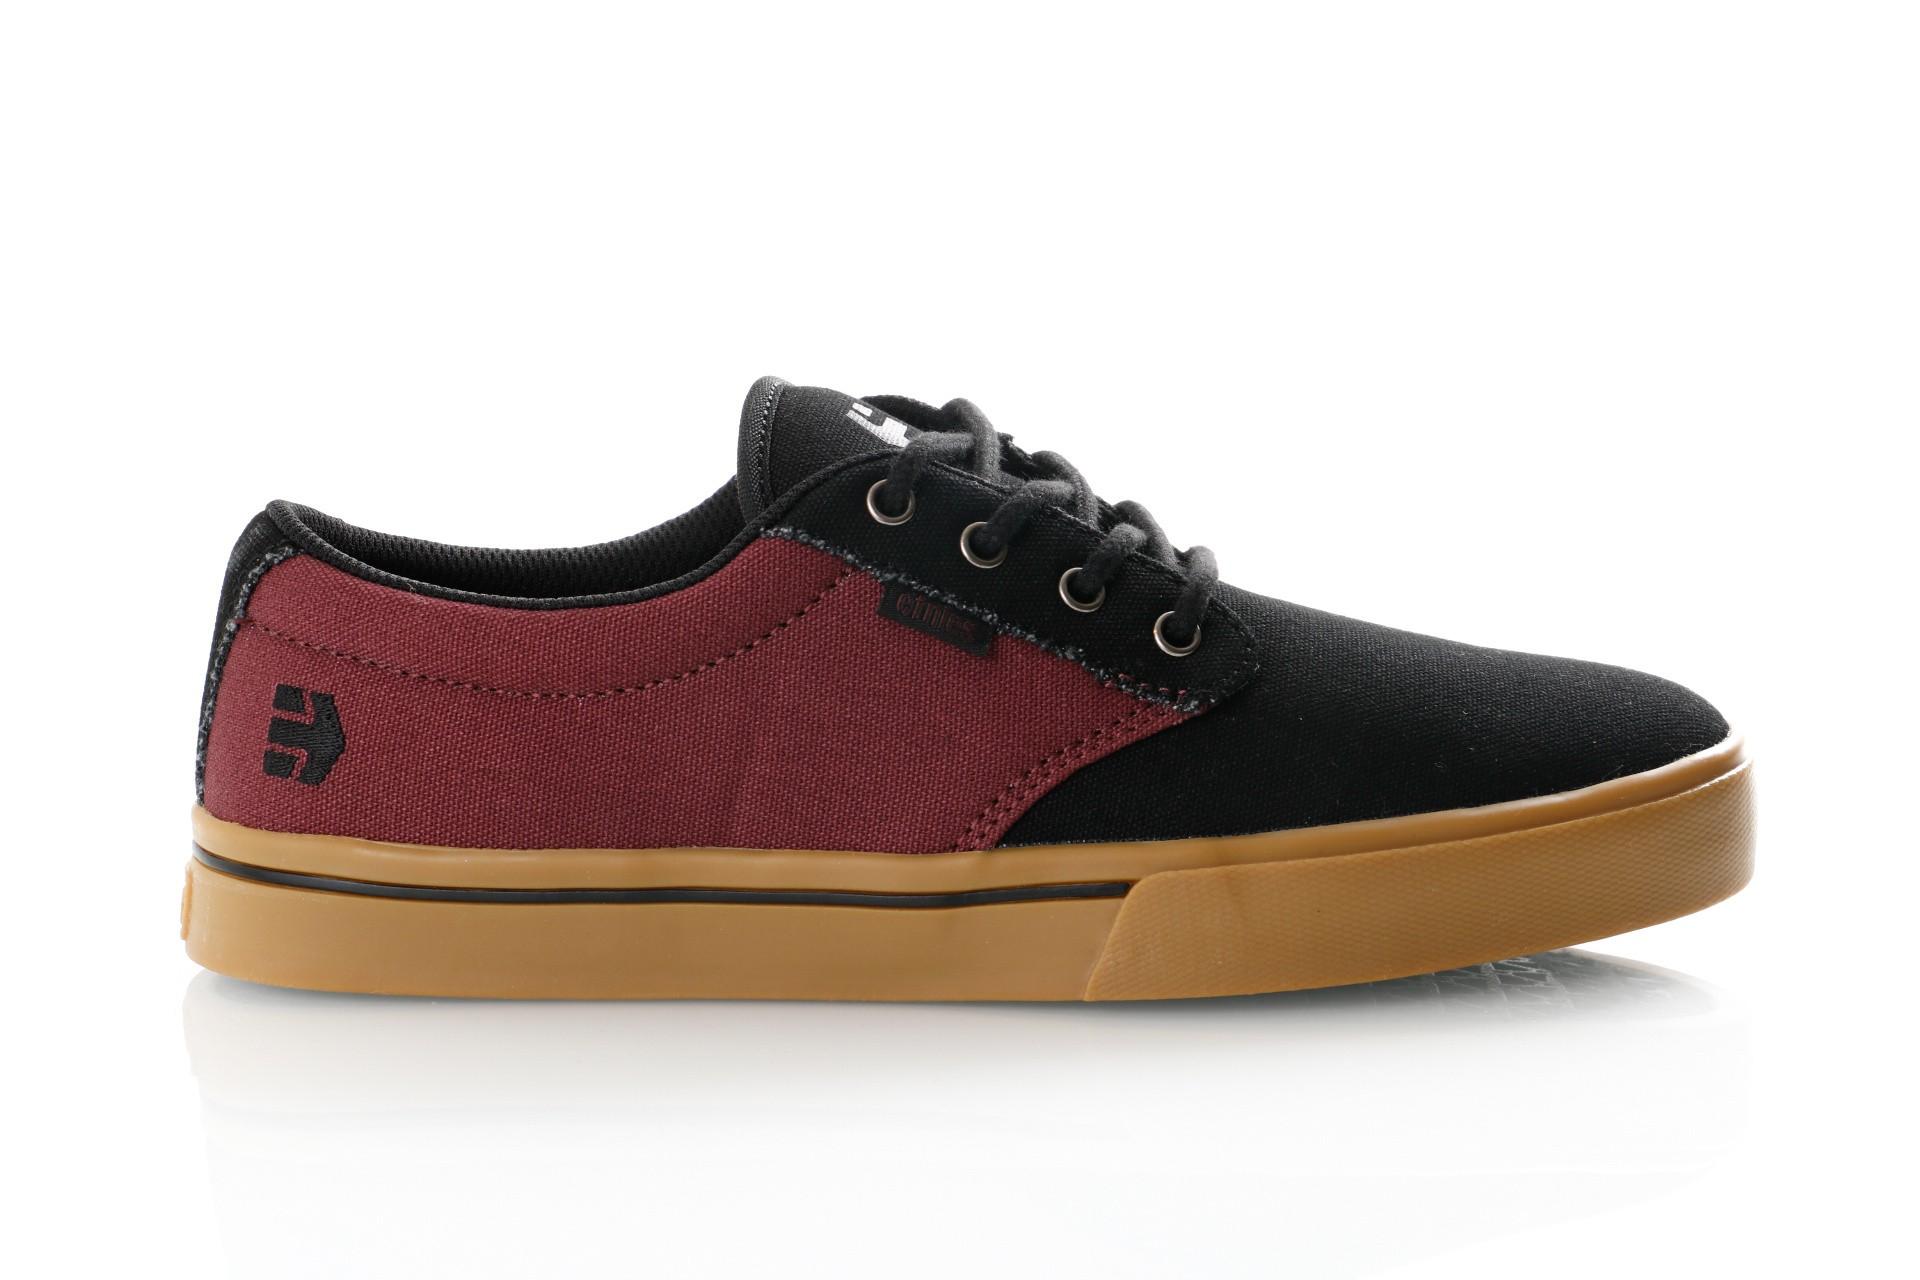 Foto van Etnies Jameson 2 Eco 4101000323 Sneakers Black/Red/Gum